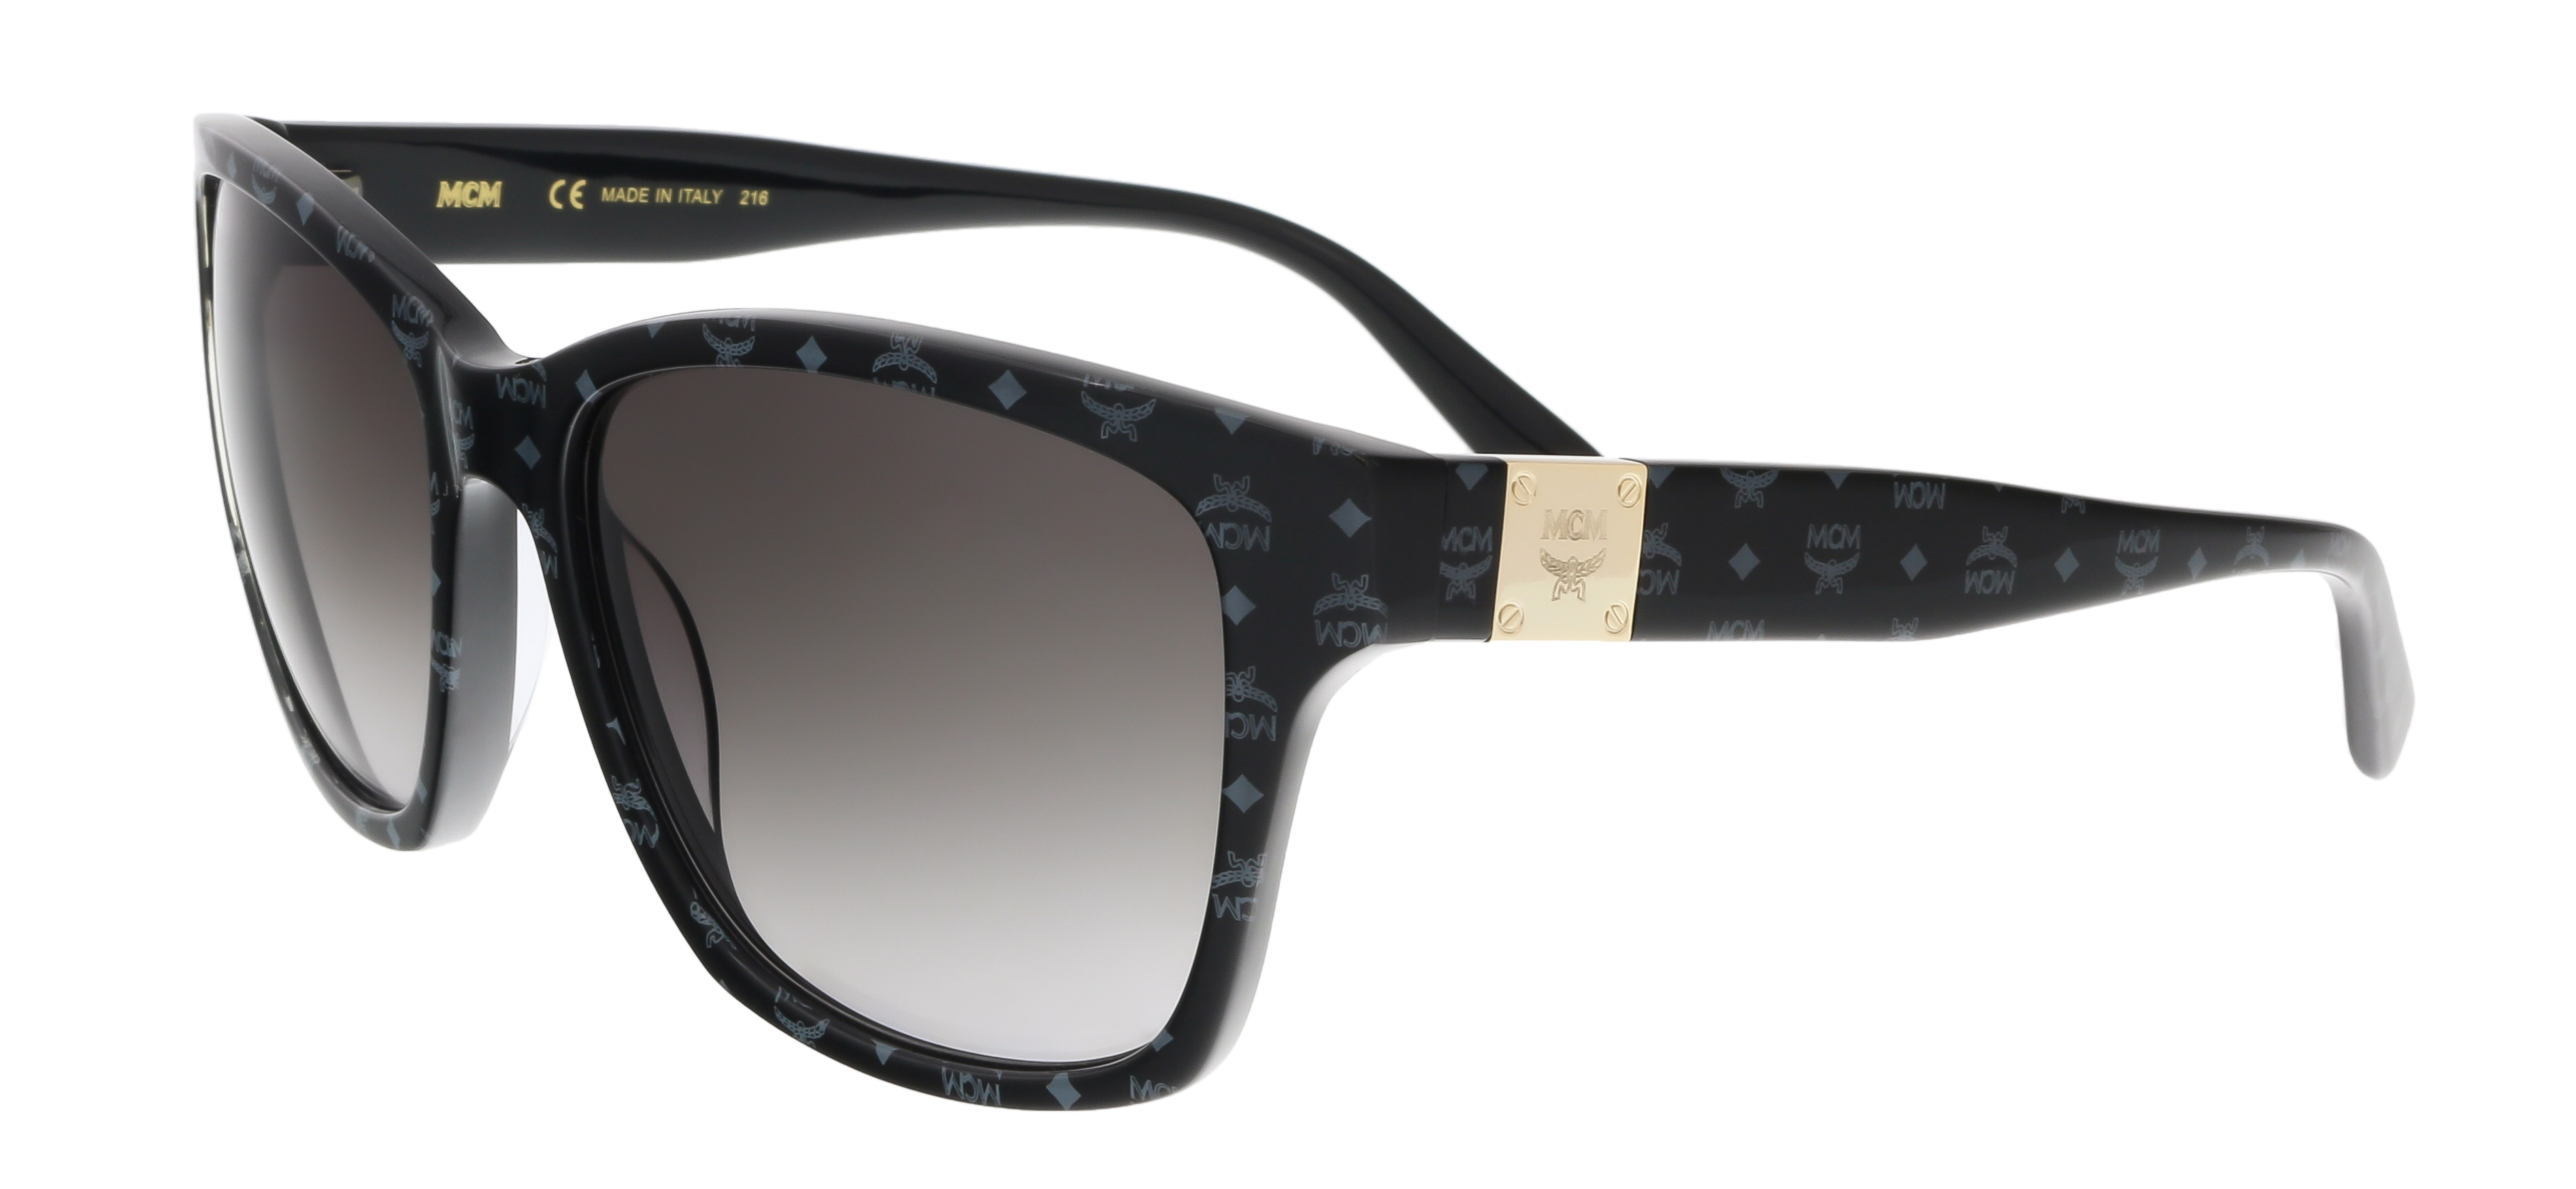 MCM600S 003 Black Visettos Wayfarer Feline Sunglasses